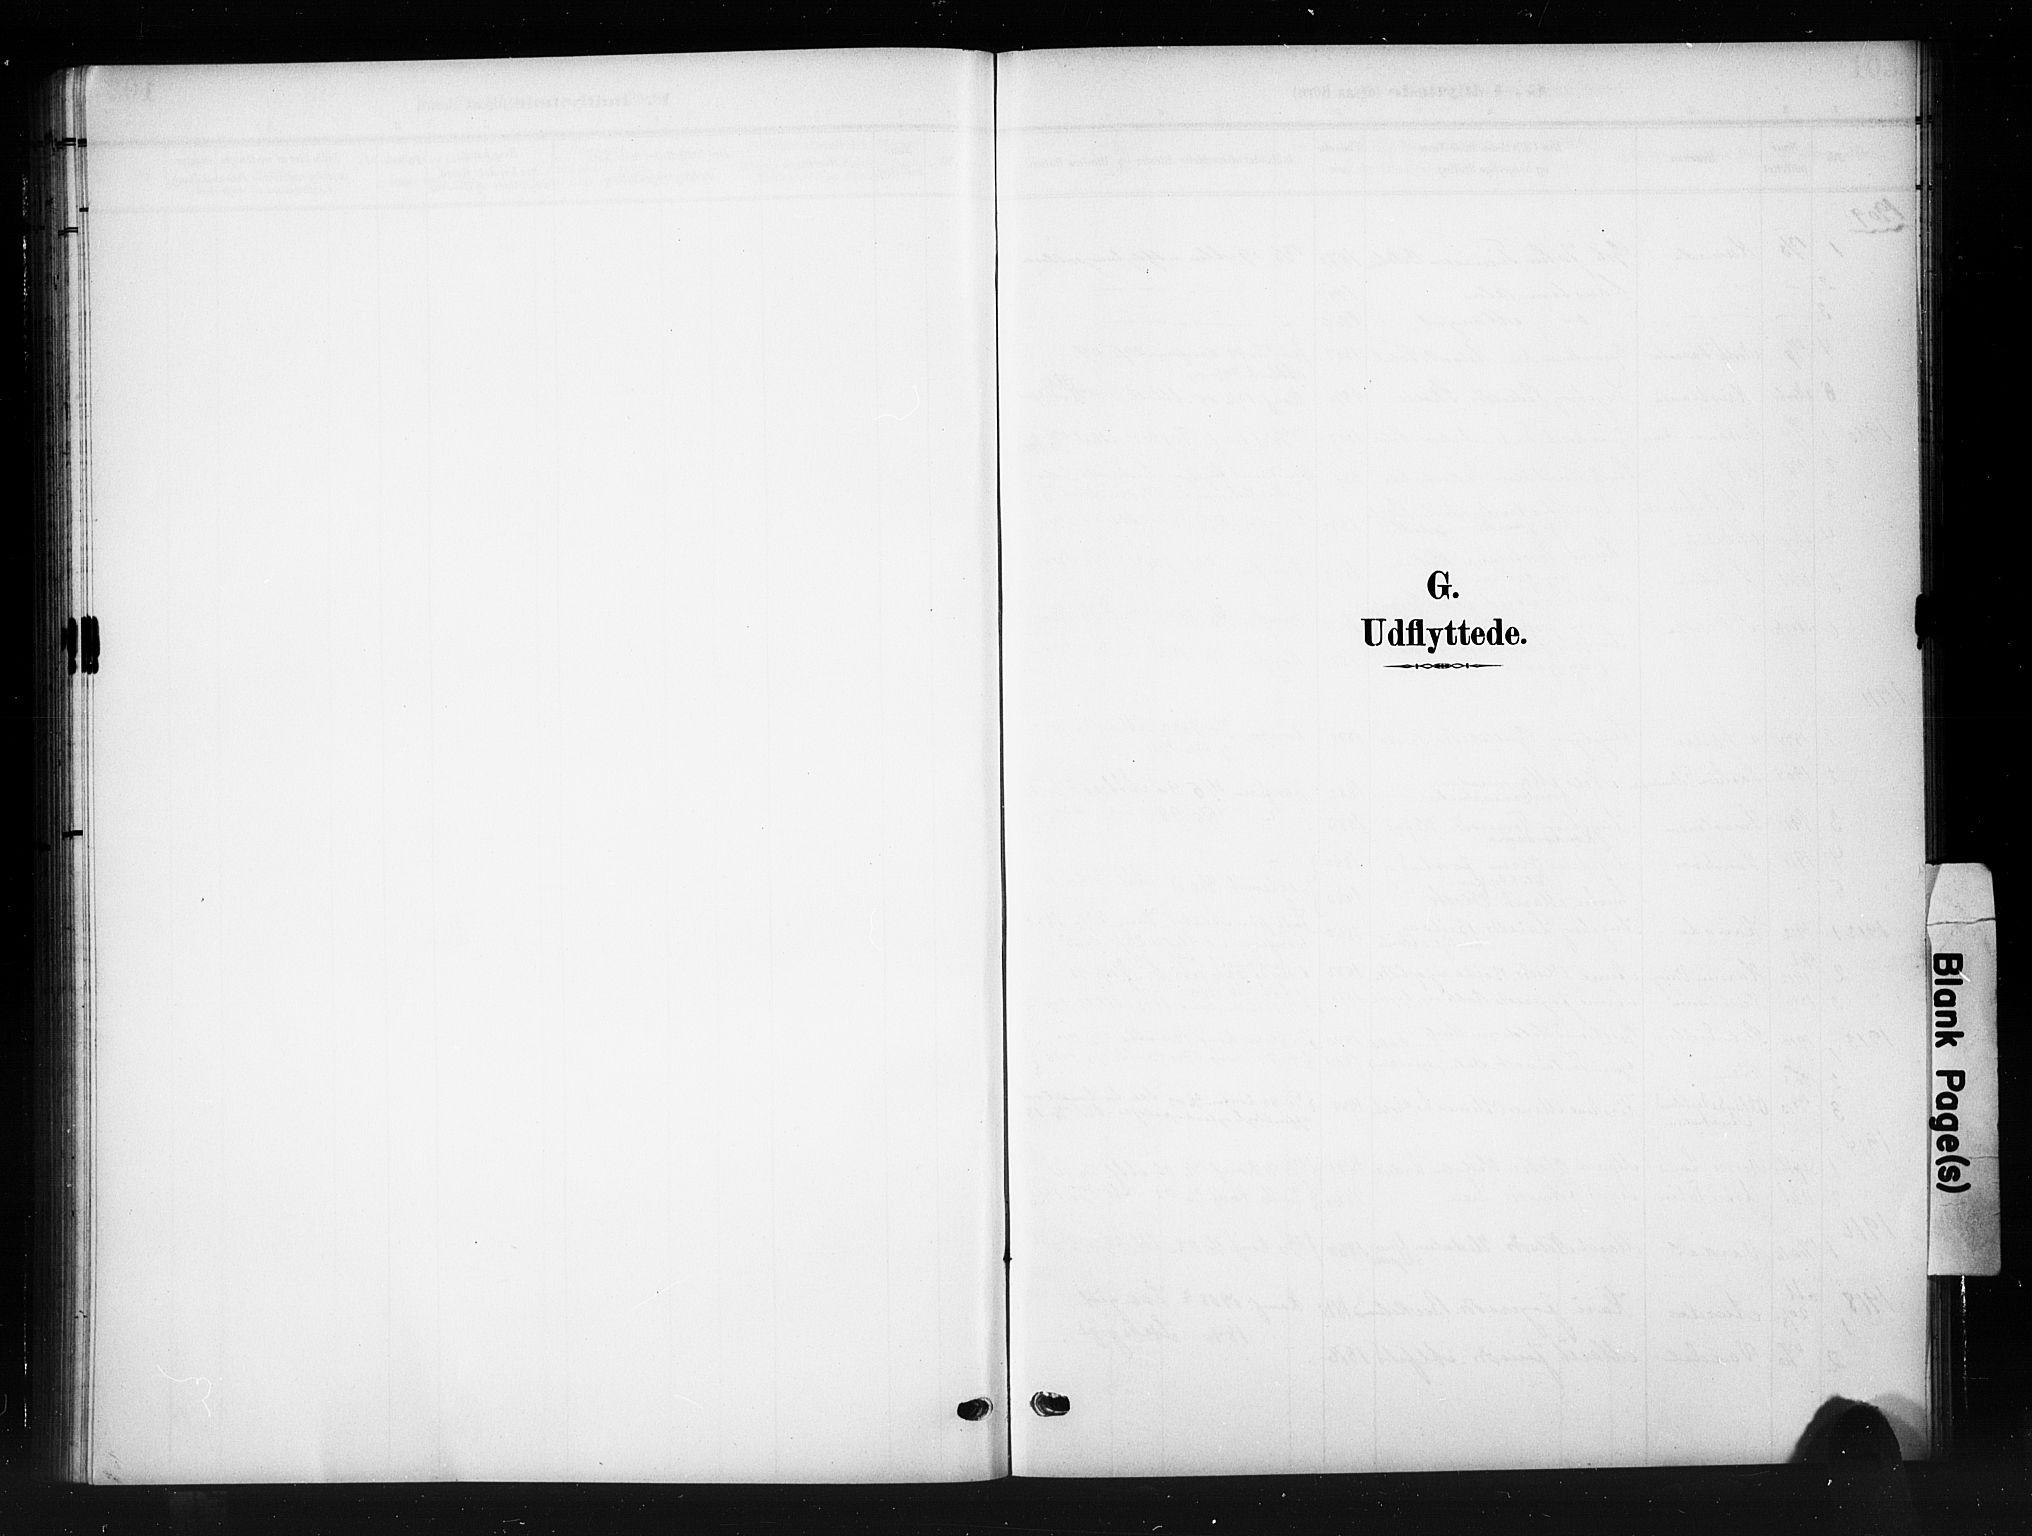 SAH, Øystre Slidre prestekontor, Klokkerbok nr. 7, 1908-1927